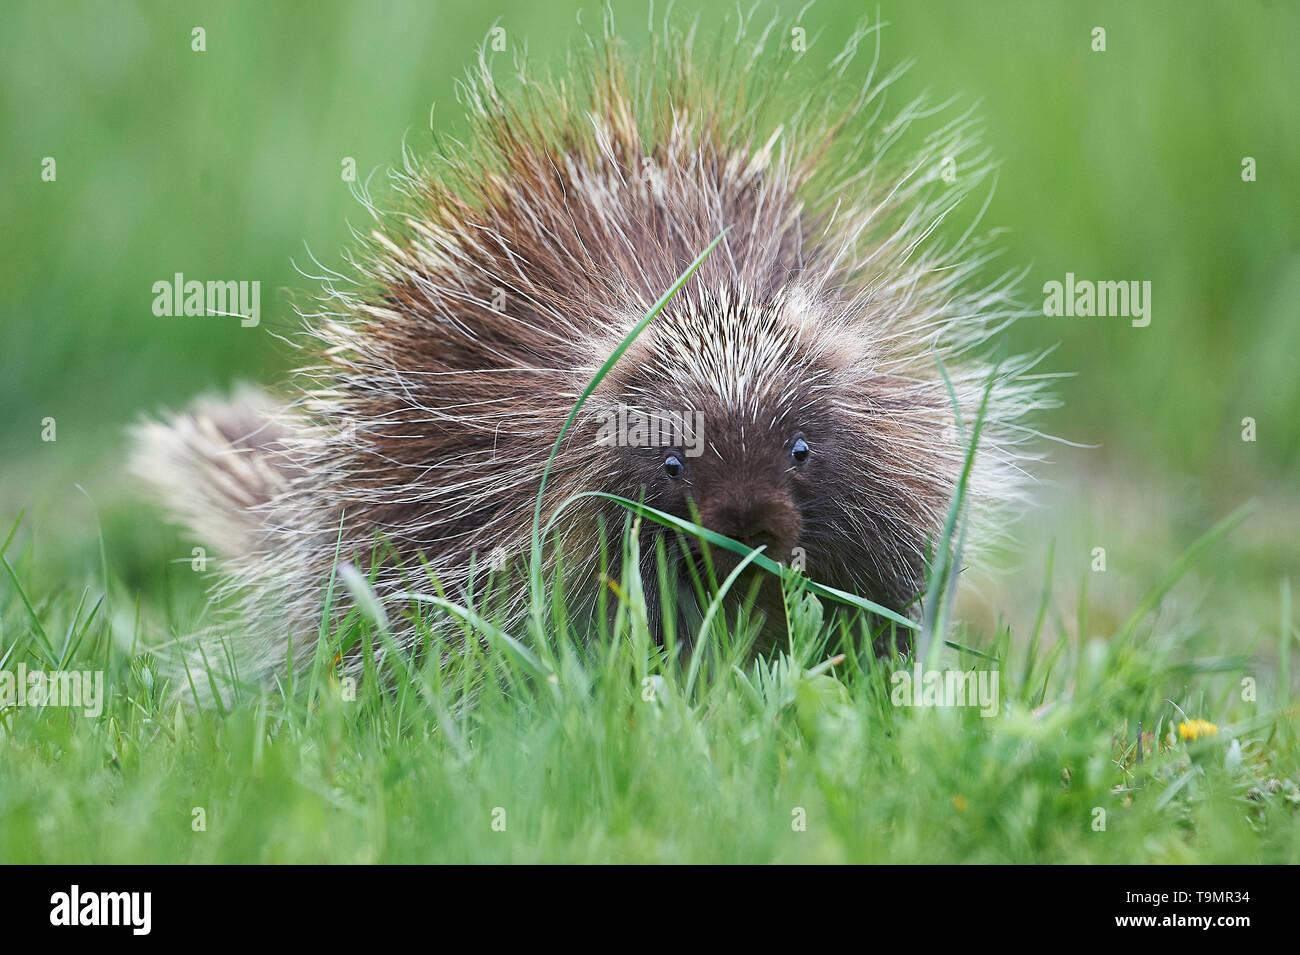 A young North America porcupine, (Erethizon dorsatum), Upper Clements, Annapolis Royal, Nova Scotia, Canada Stock Photo